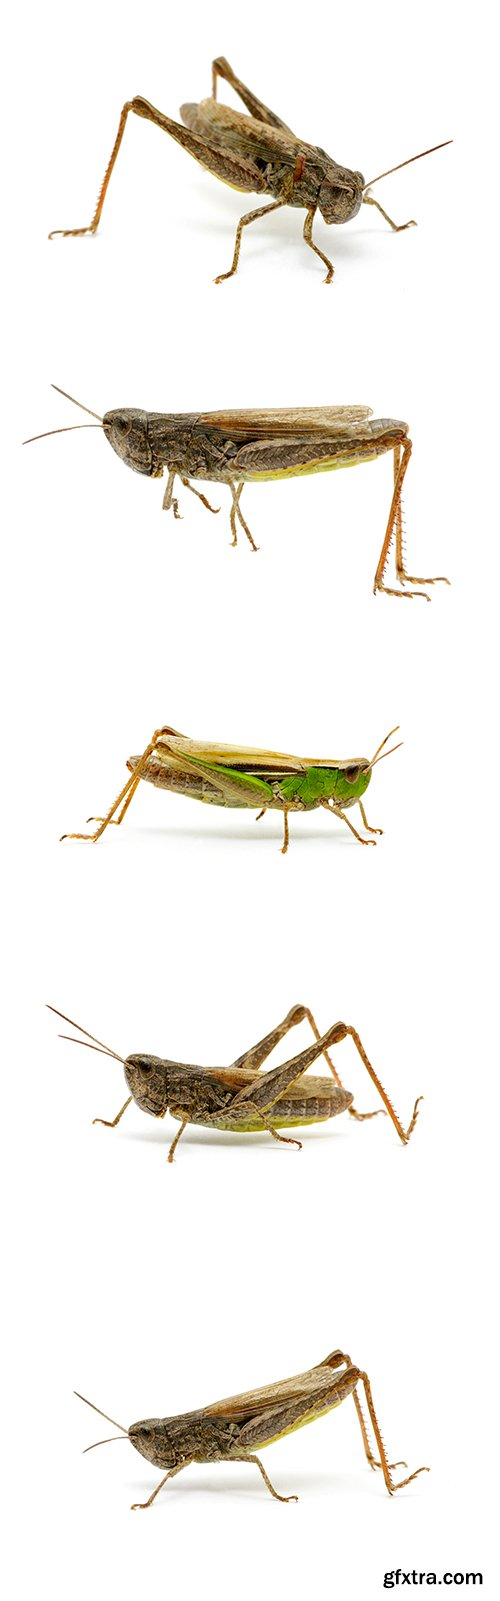 Grasshopper Isolated - 7xJPGs